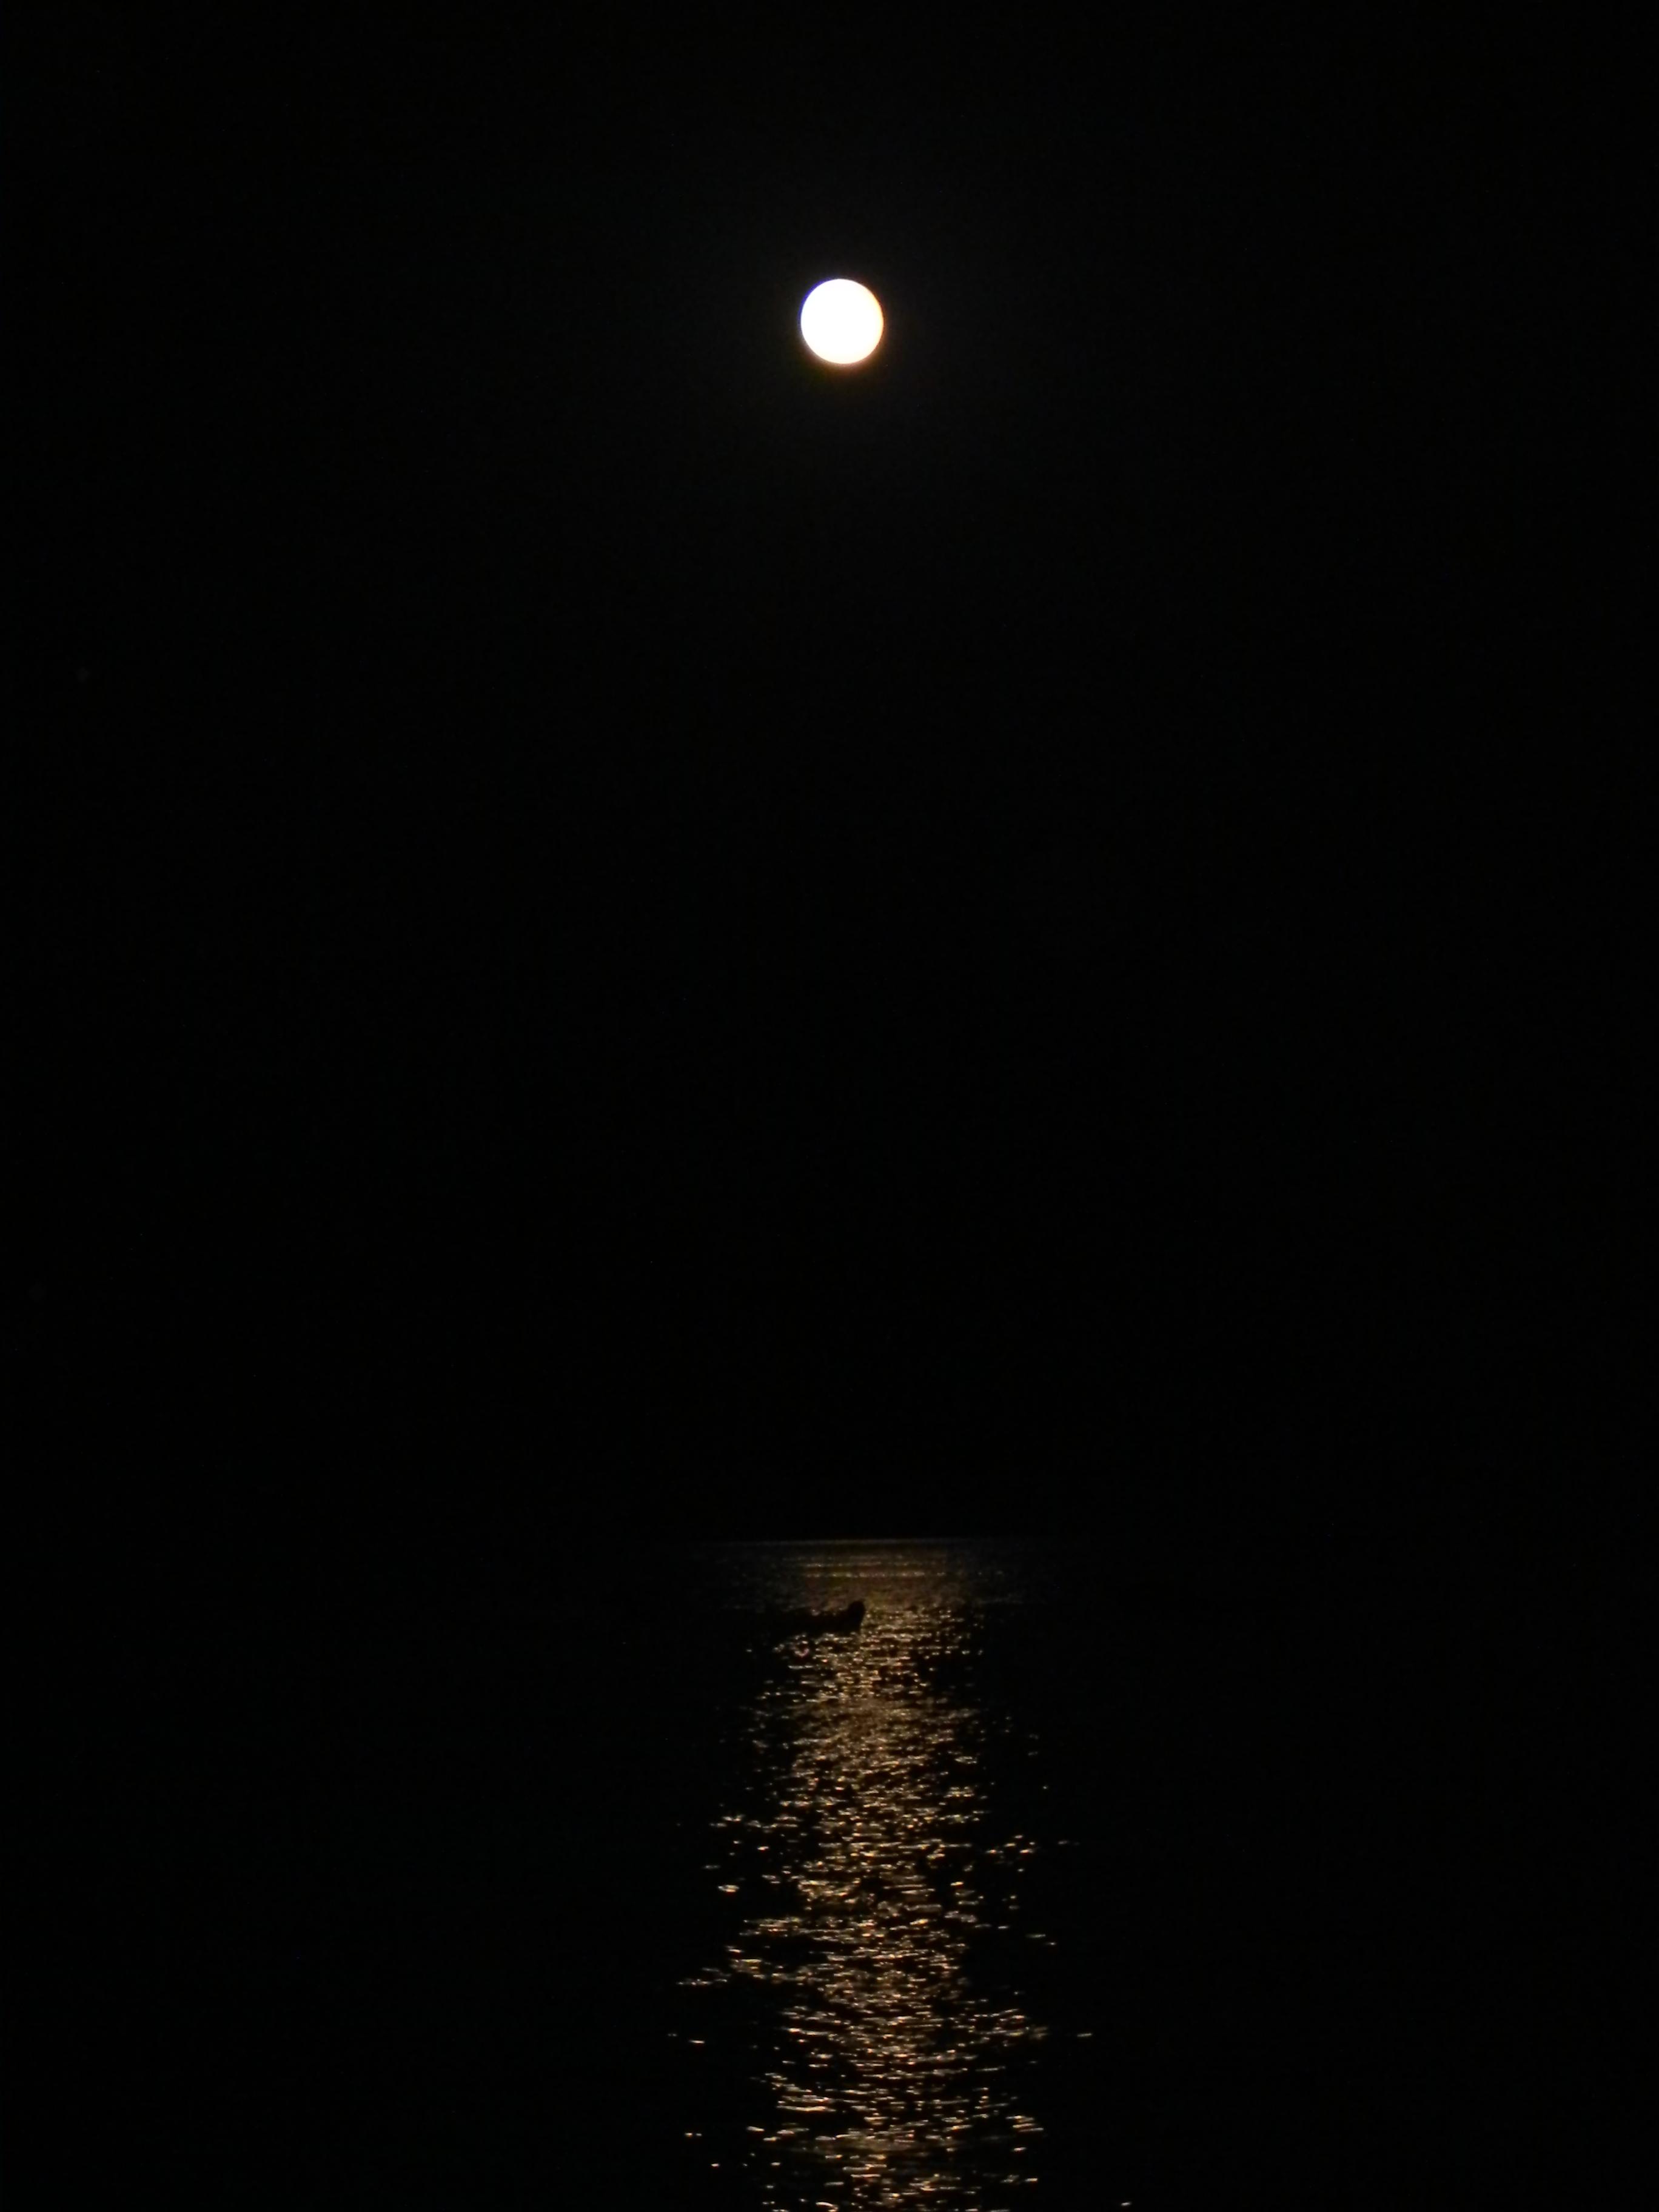 Filela Luna Sul Marejpg Wikimedia Commons